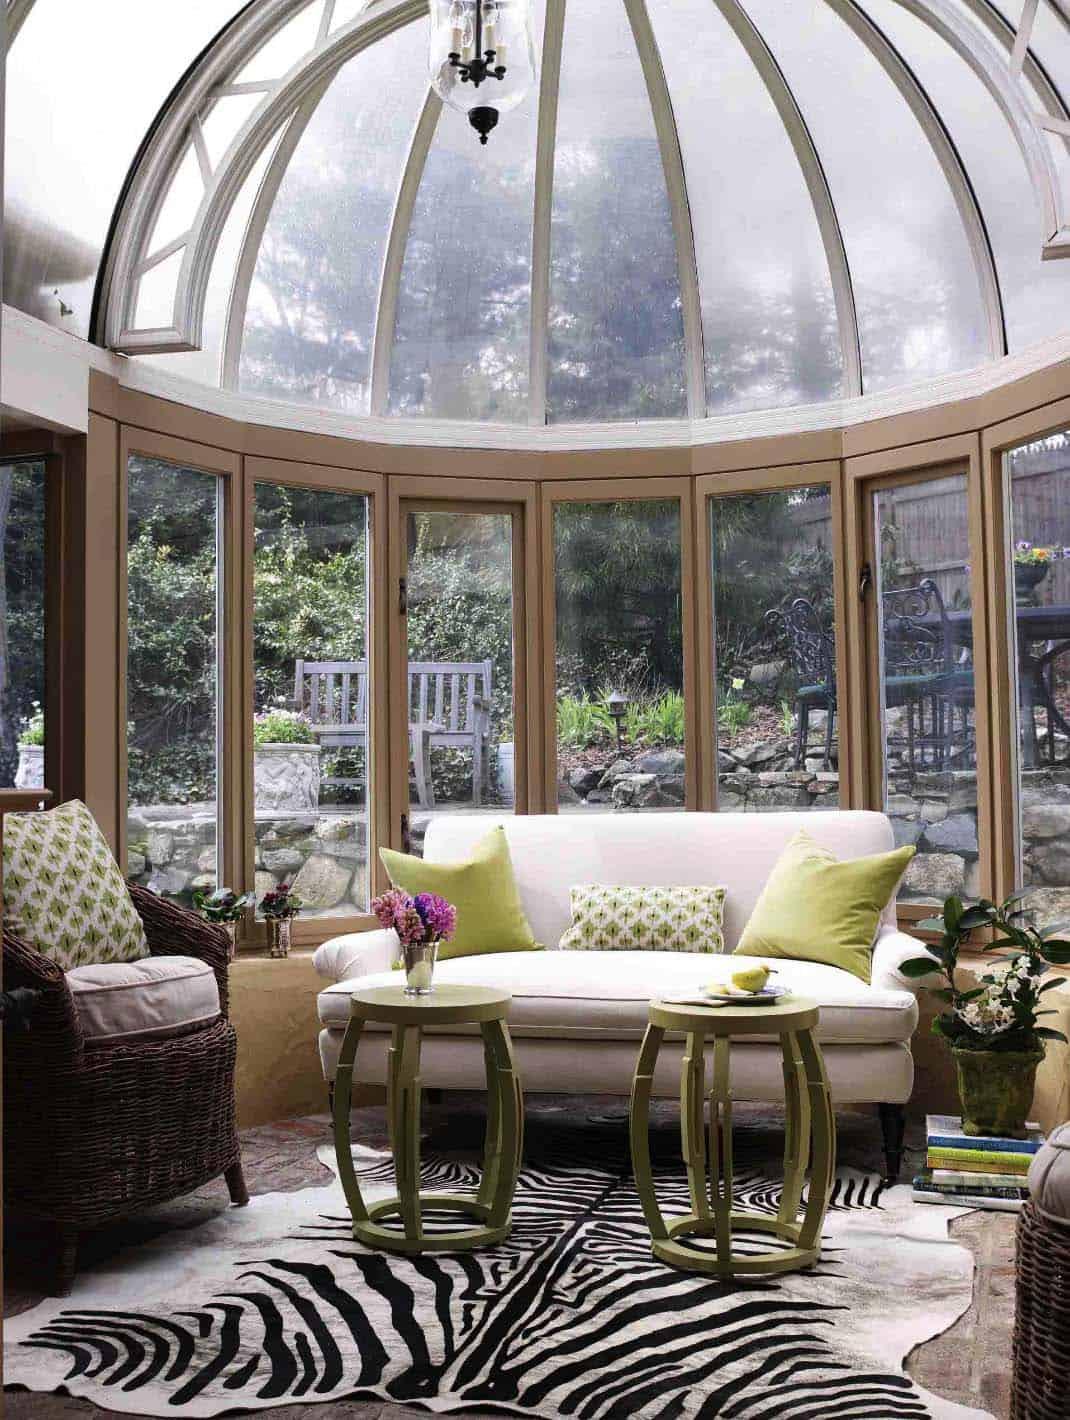 Amazing-Conservatory-Greenhouse-Ideas-17-1-Kindesign